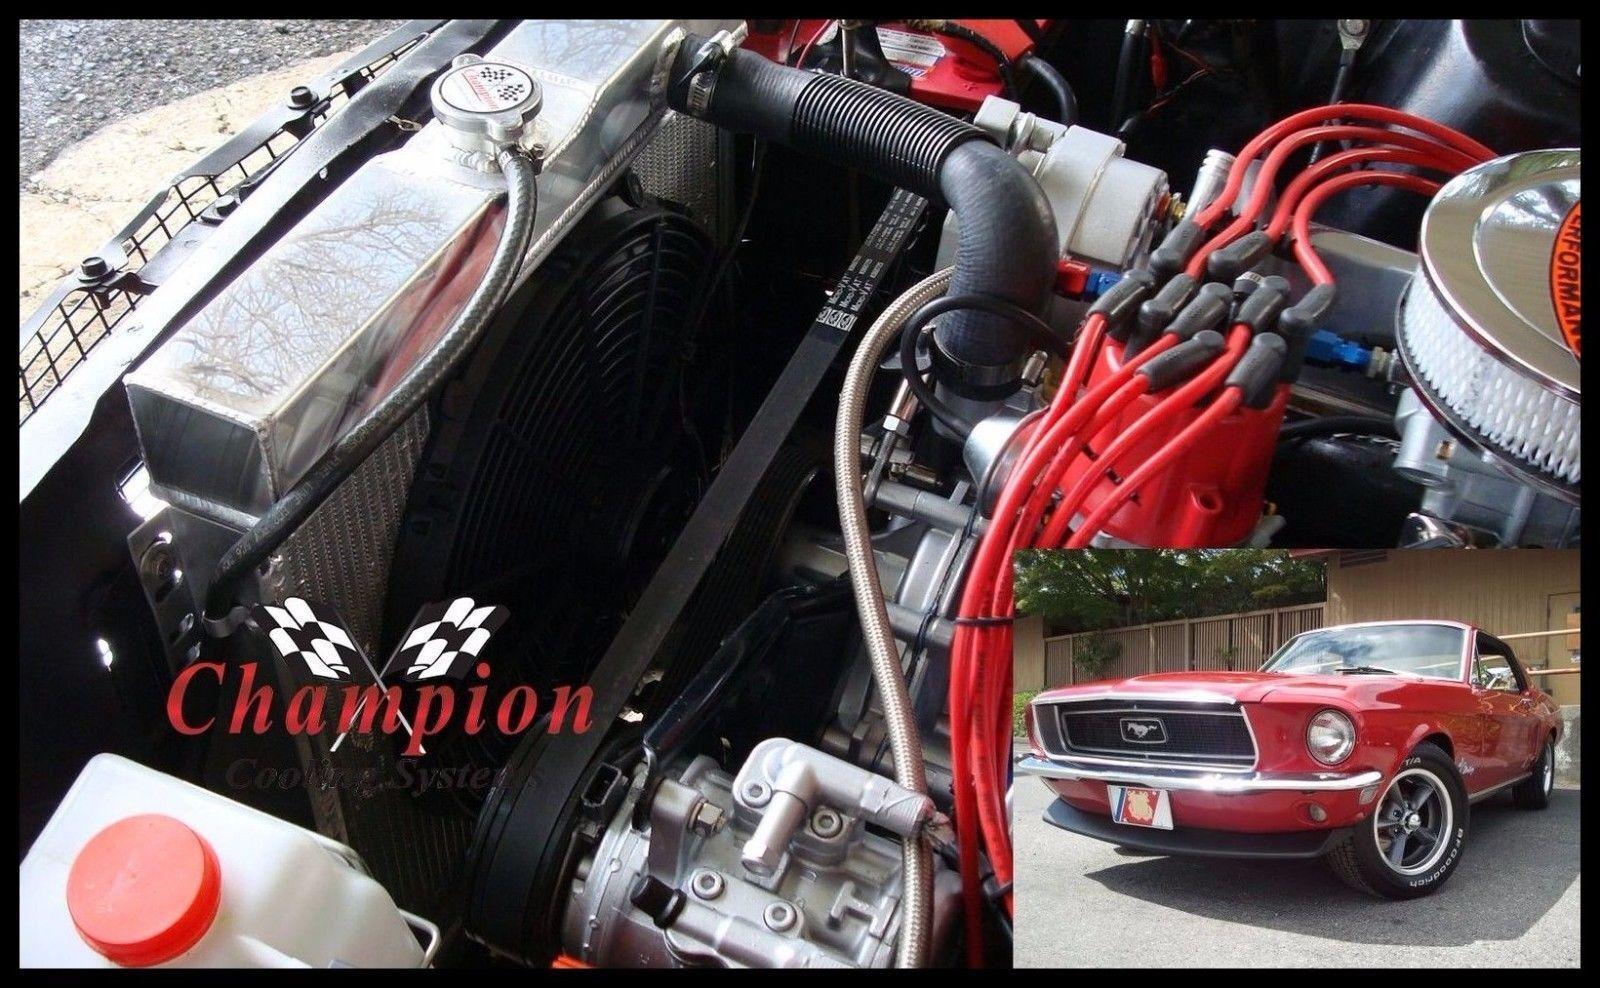 Mercury Cars Champion Racing 3 Row Aluminum Radiator CC340 For 1963-70 Ford